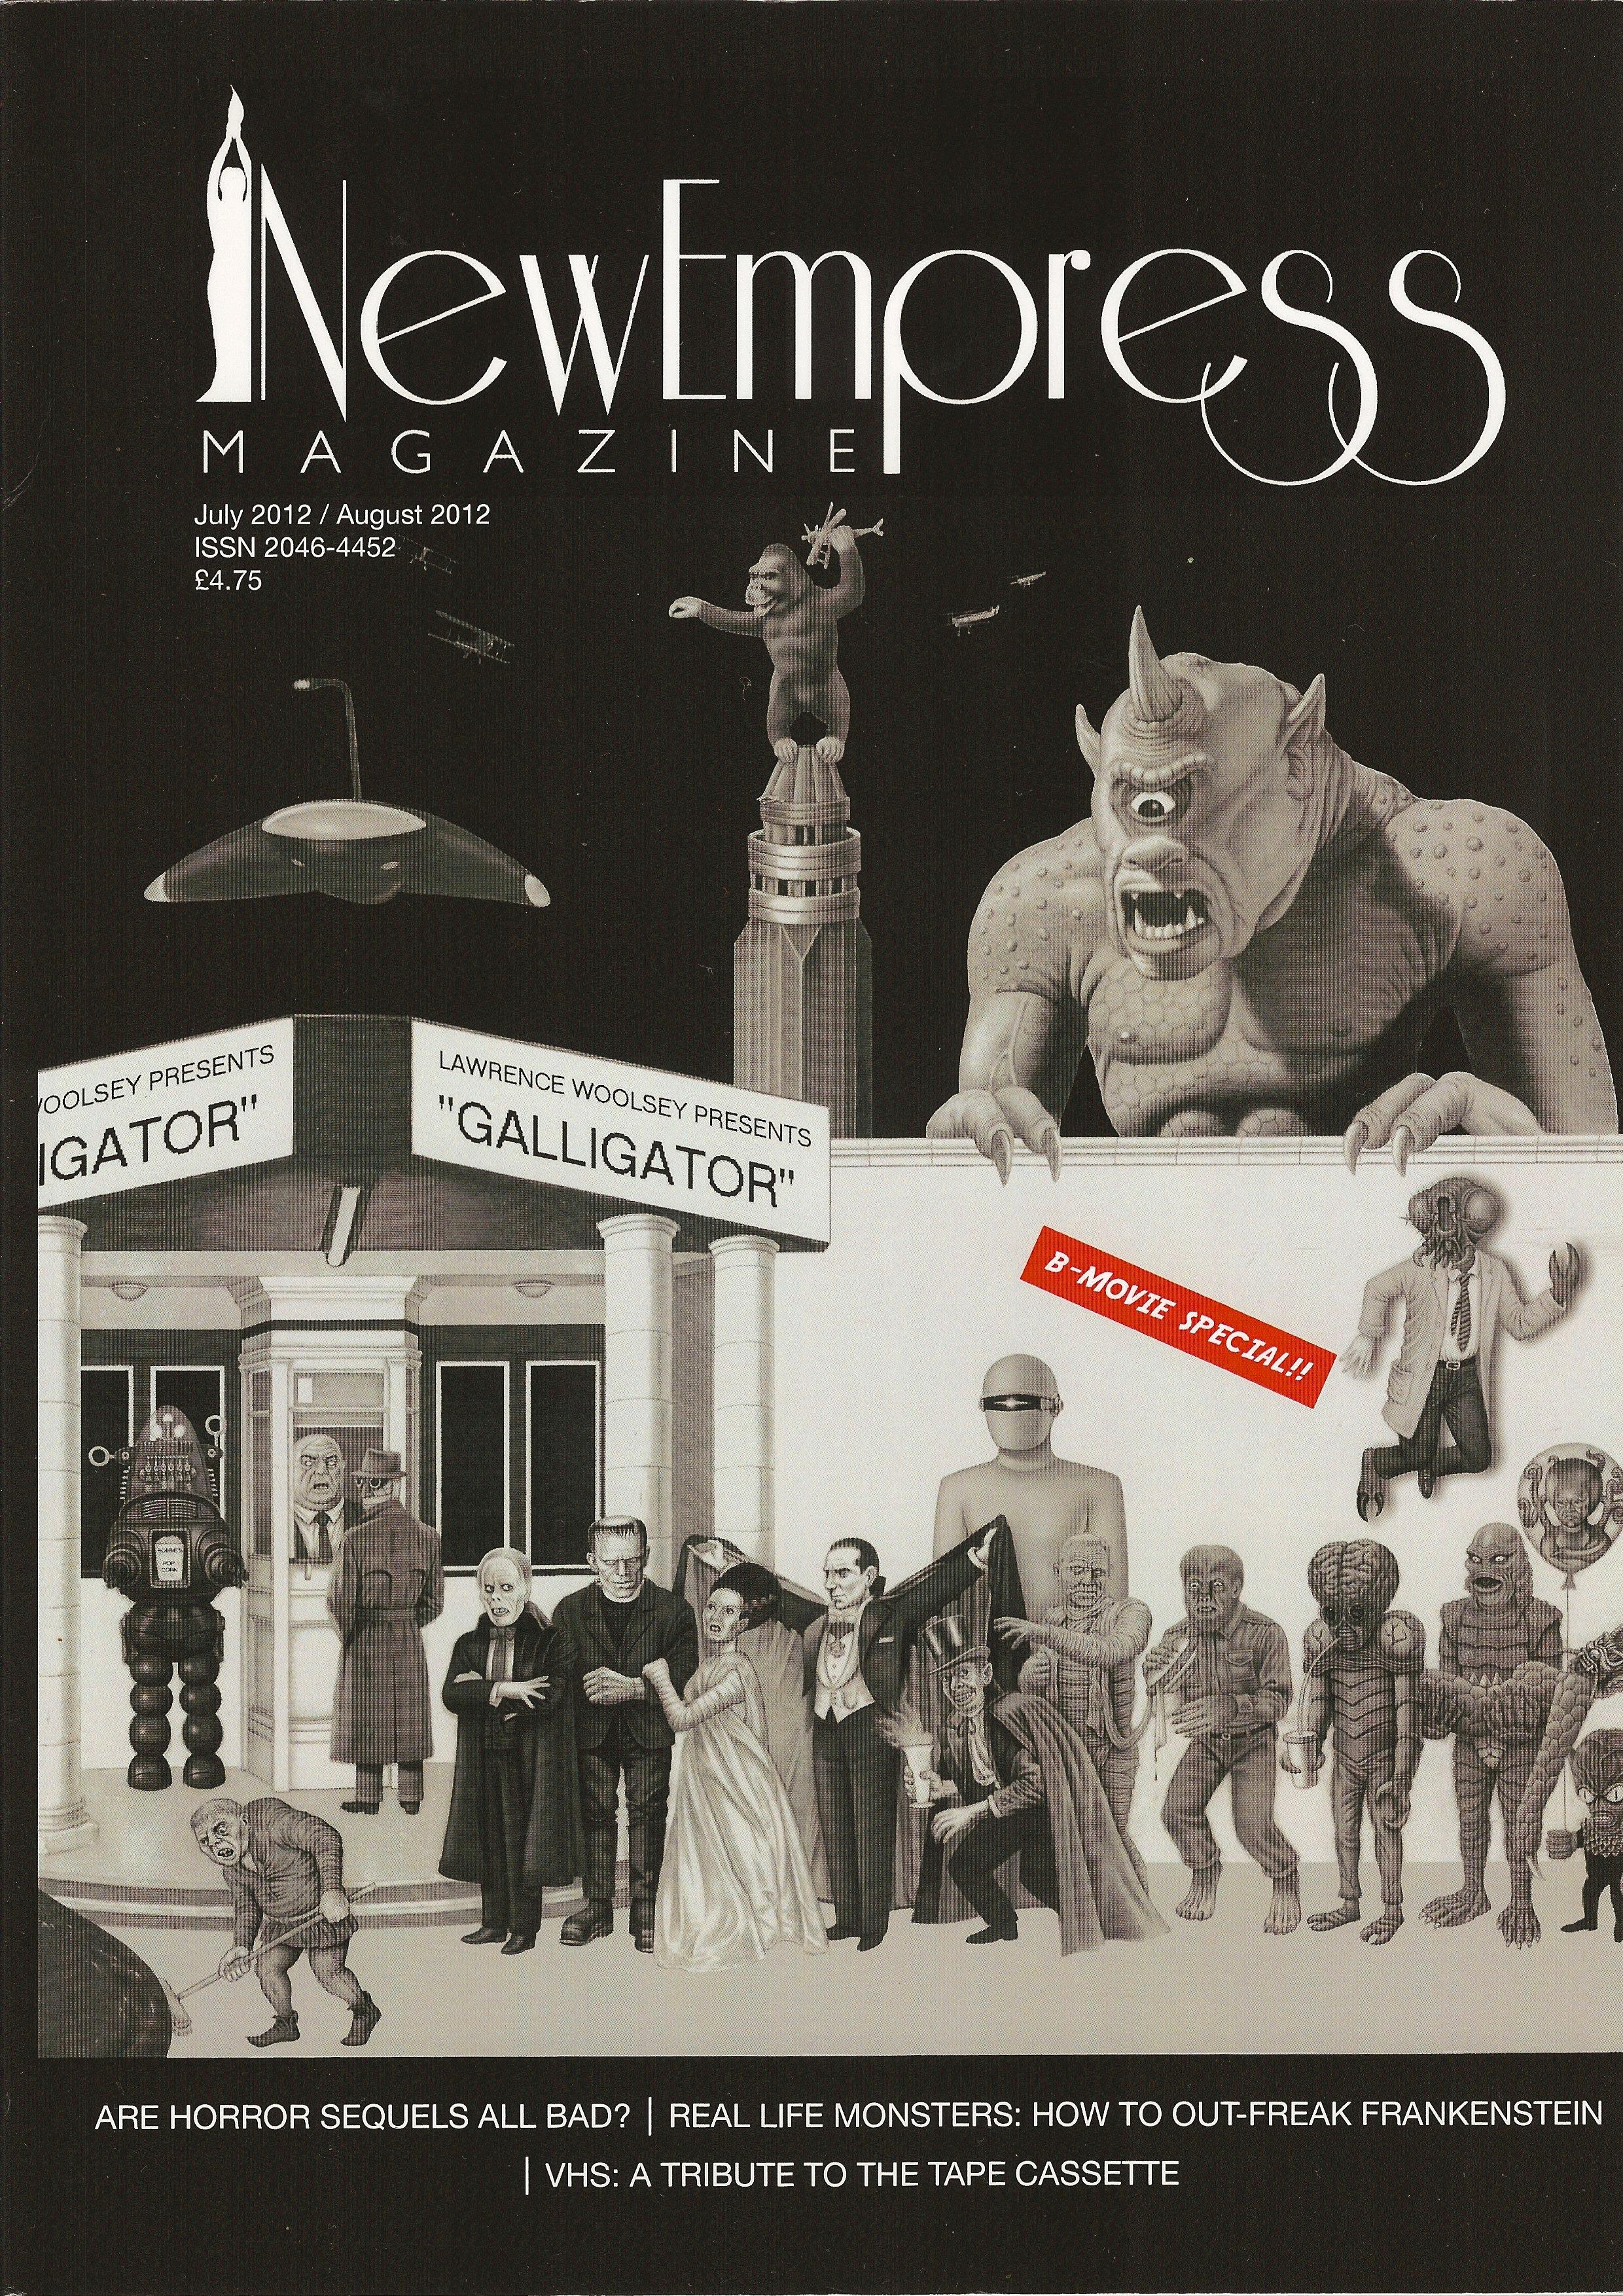 New Empress magazine cover